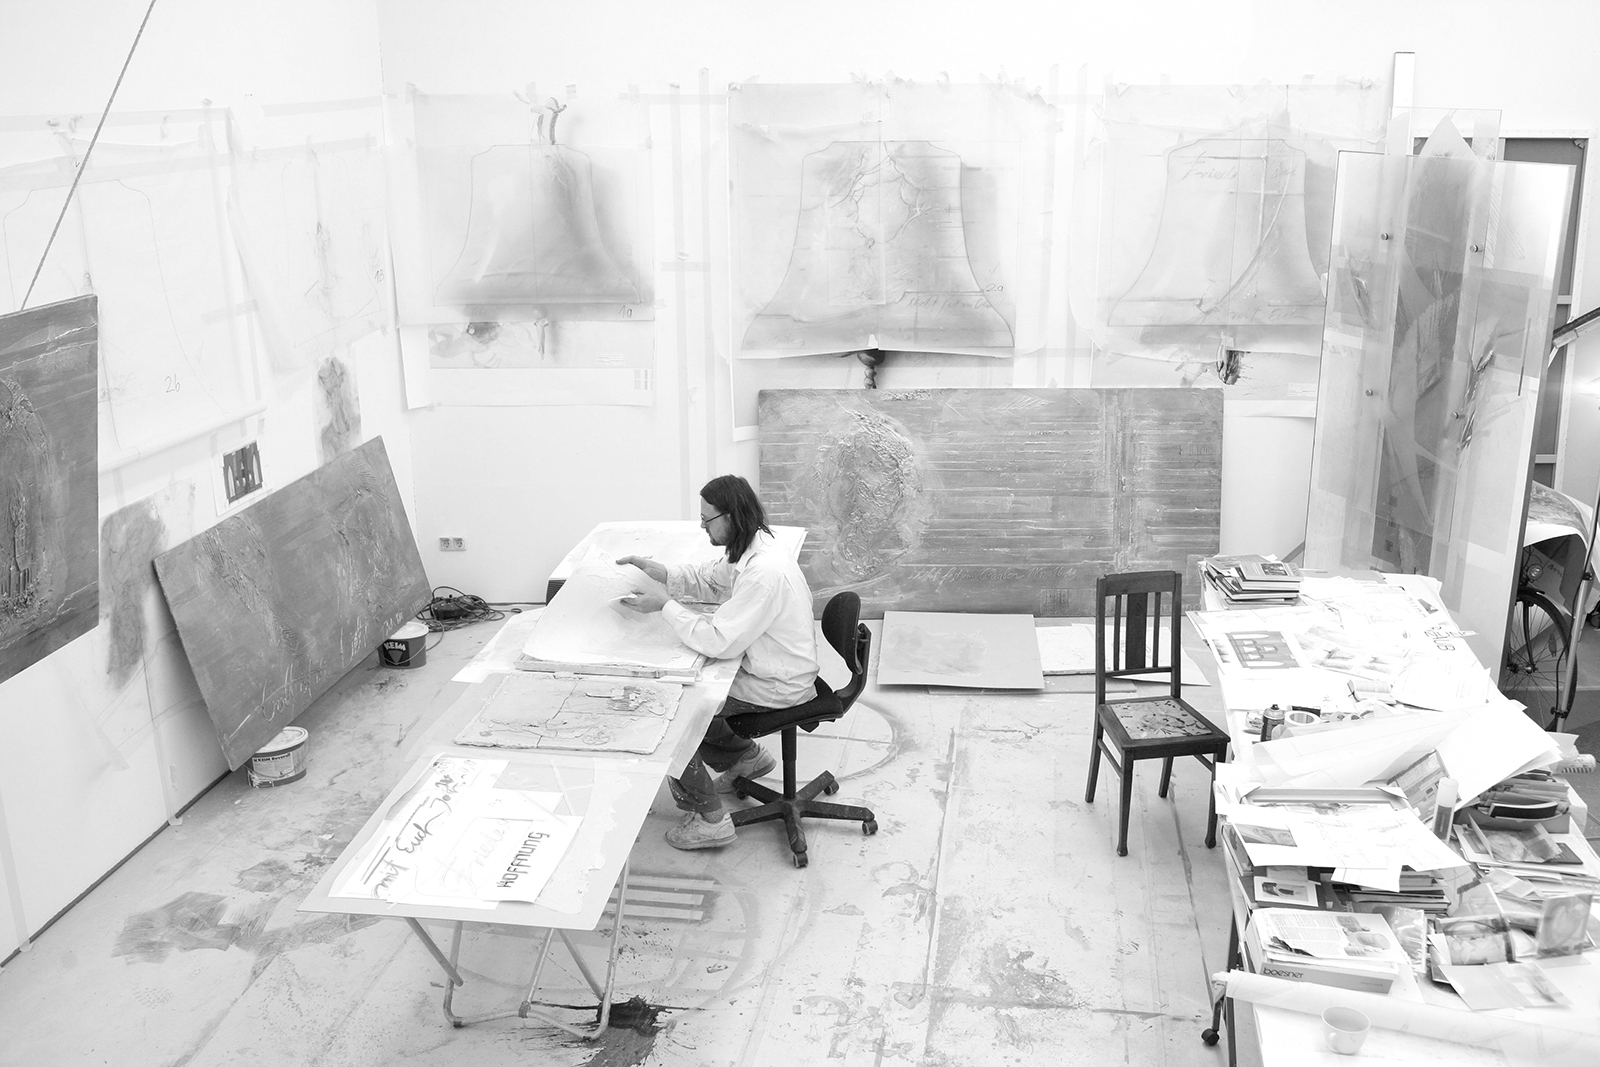 Atelier 2008, Entwurf Glockenzier für St. Stephan Mainz